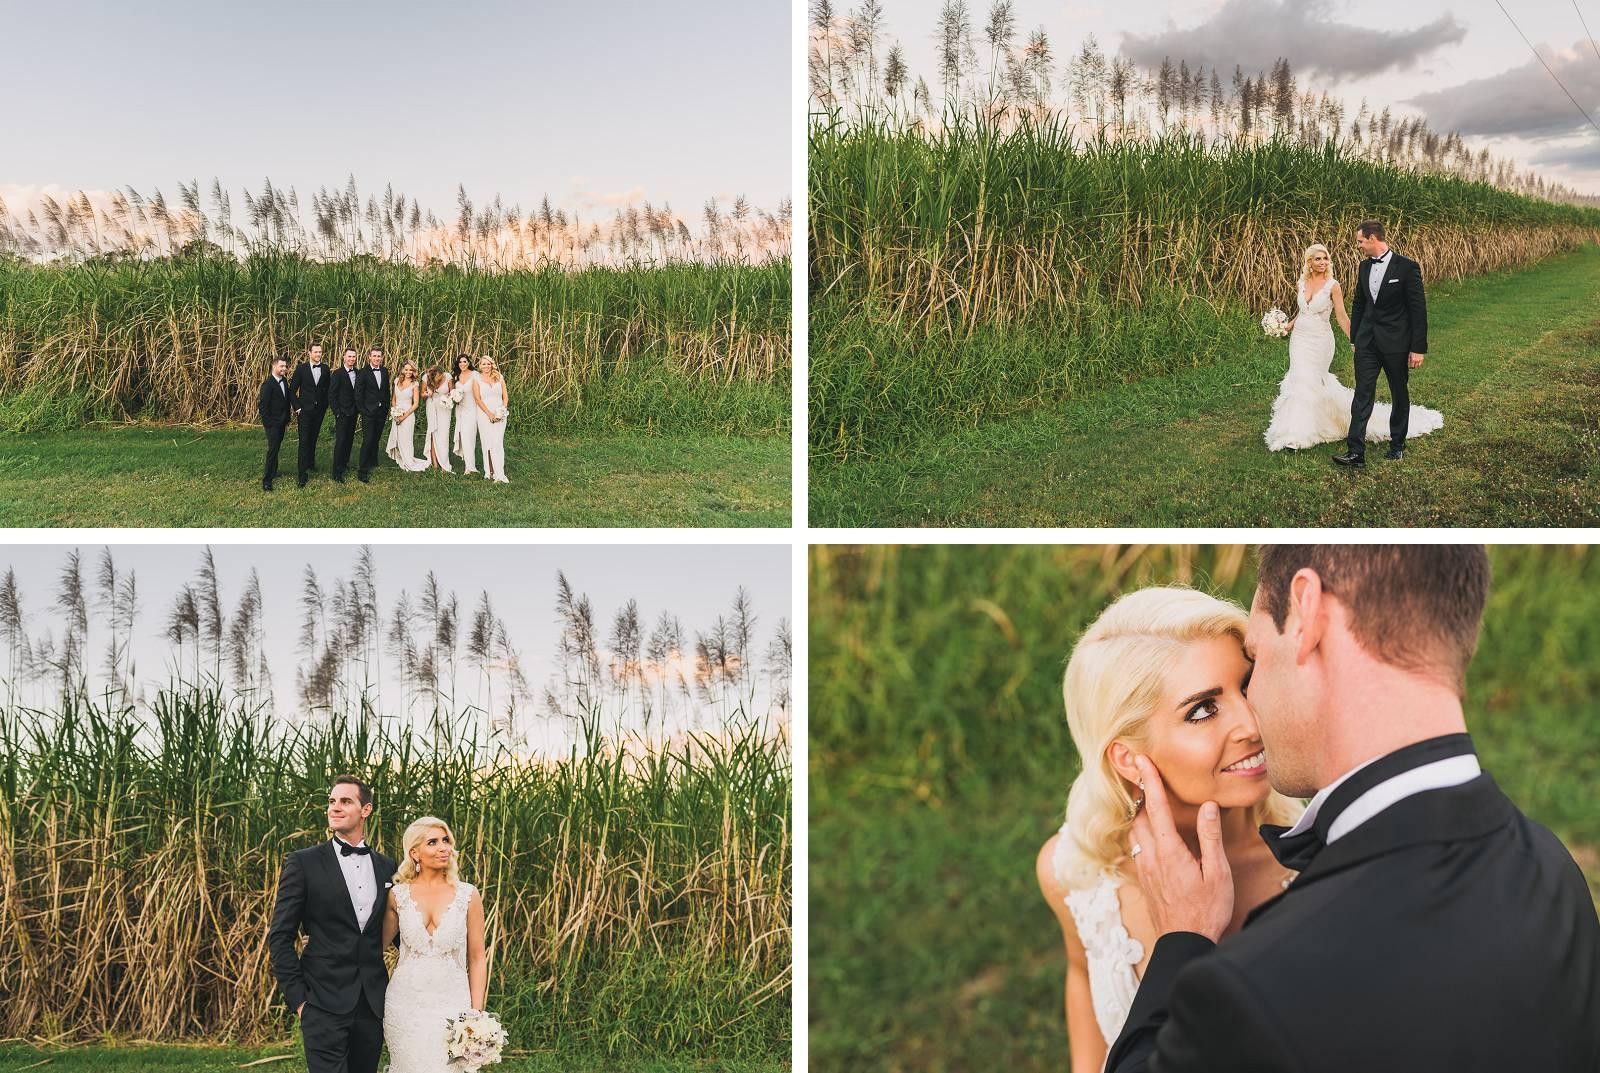 Palm Cove Cane Wedding Photo